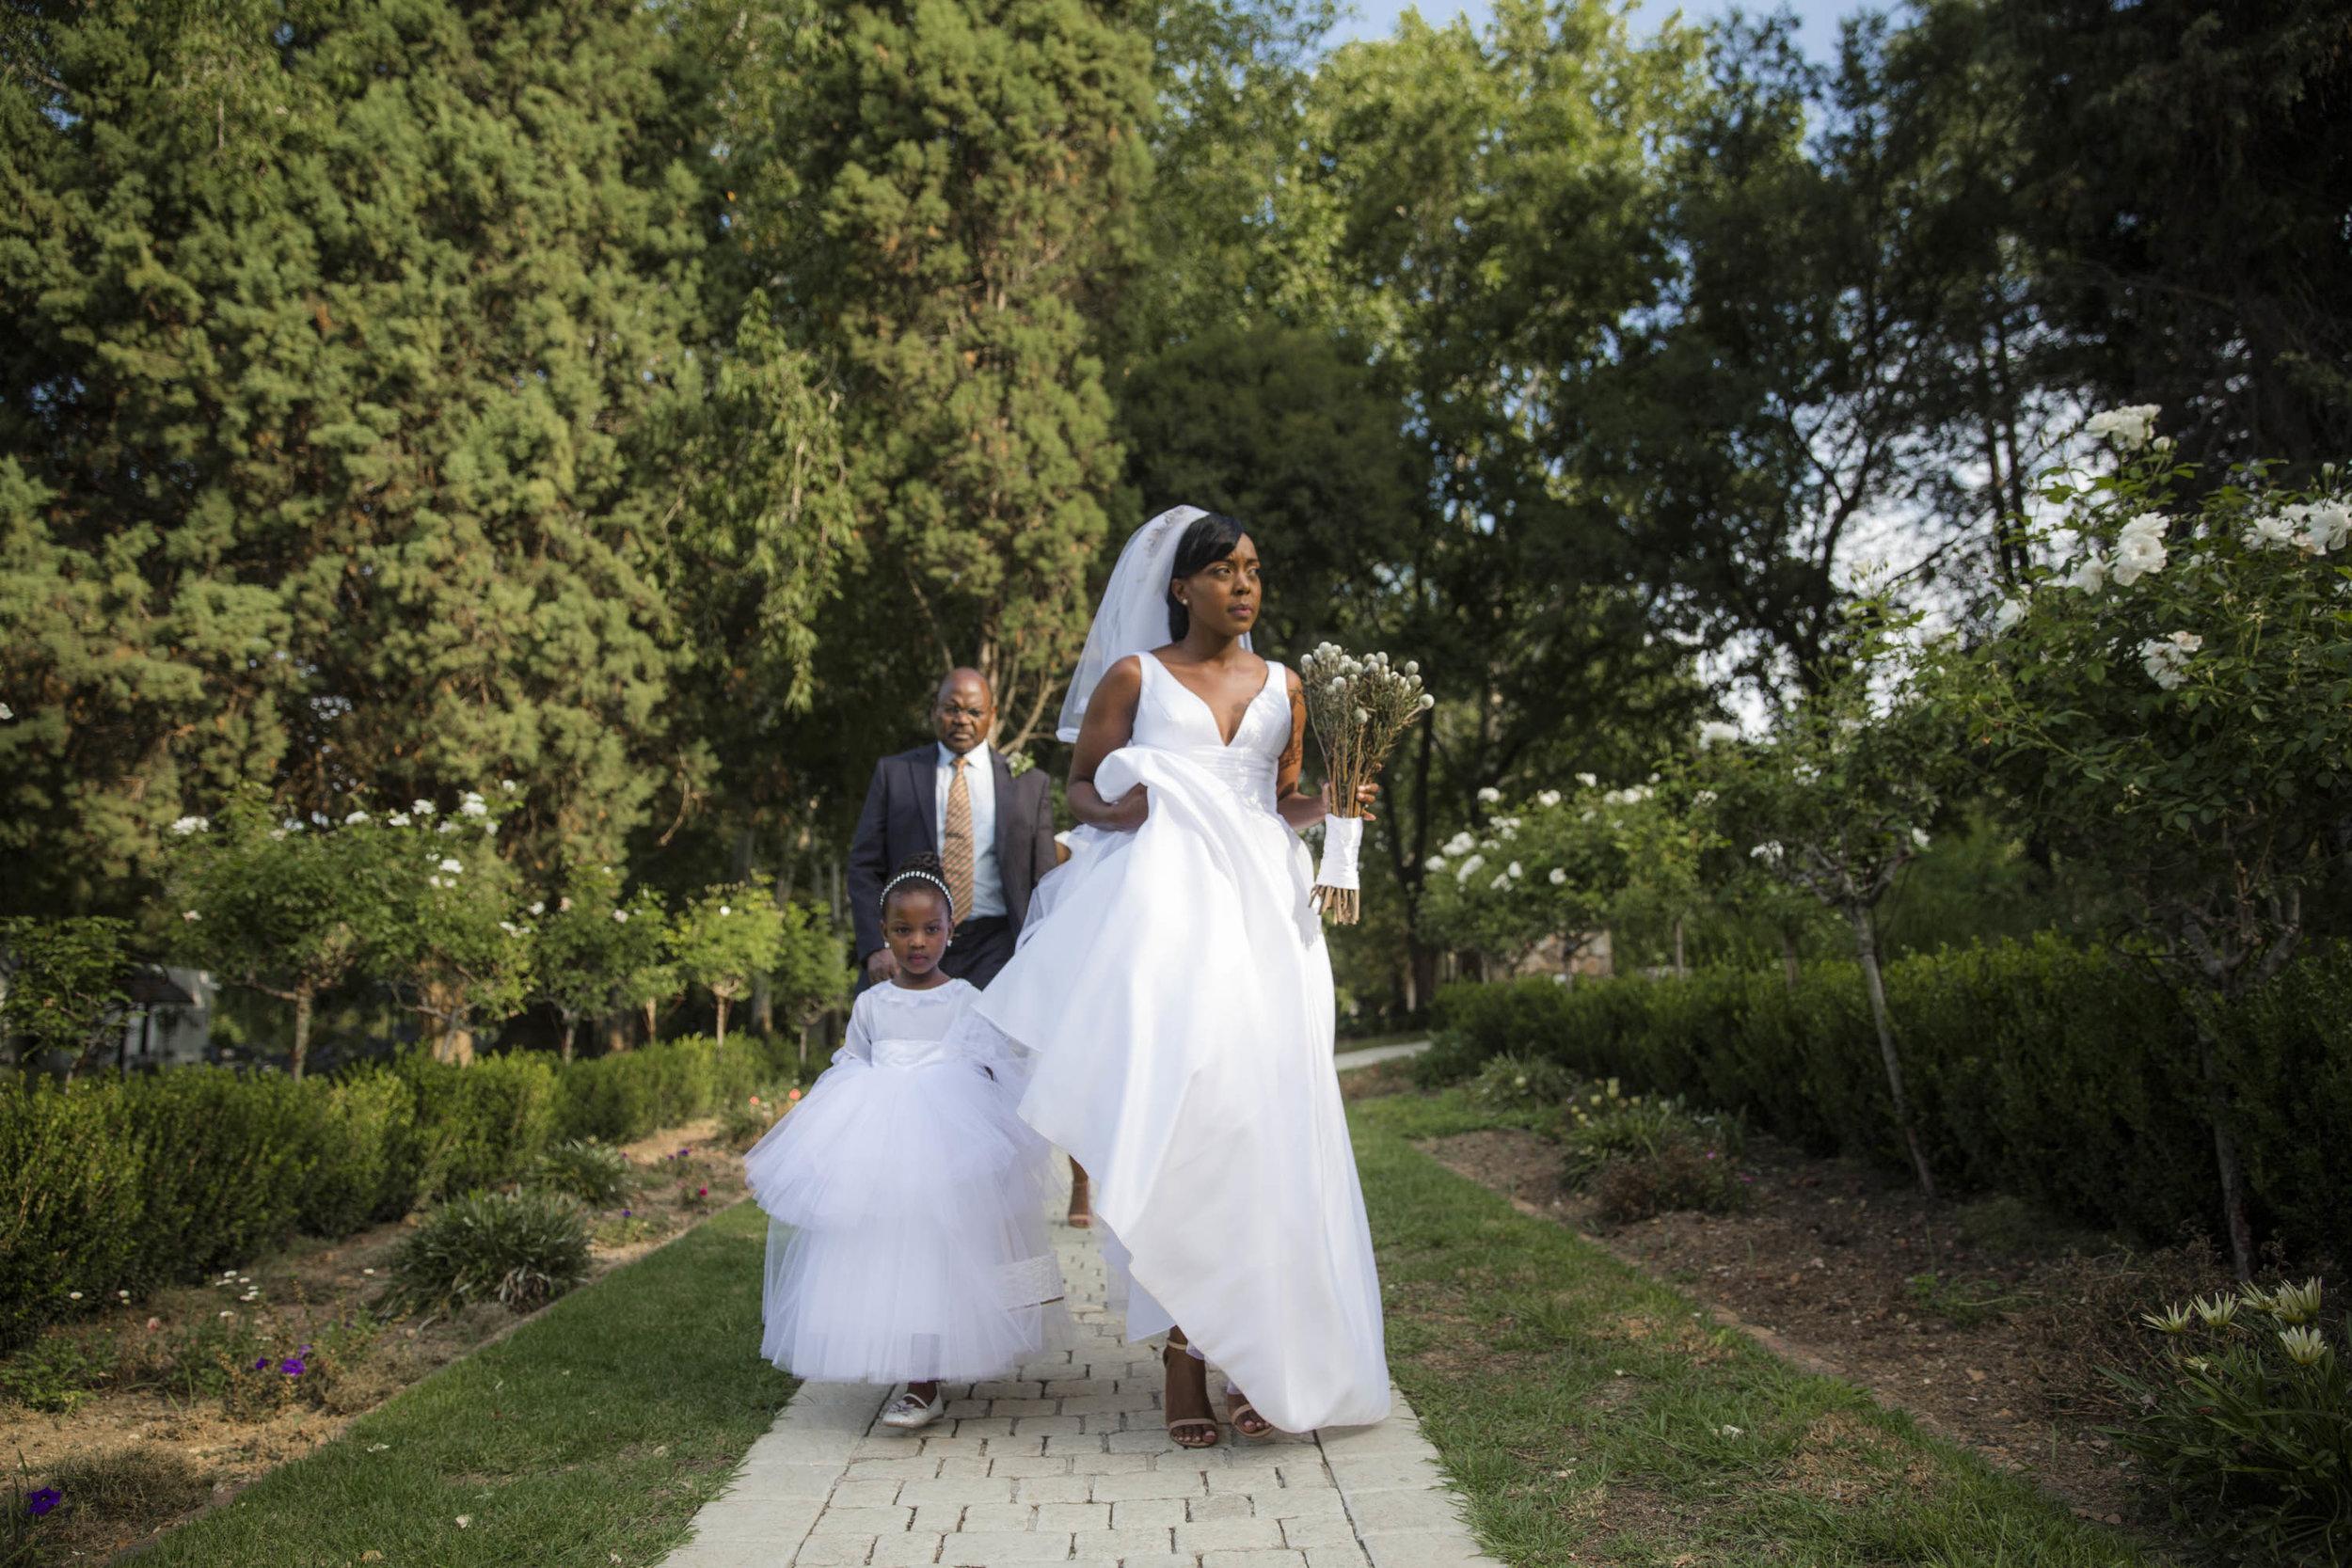 059-wedding-photography-packages-johannesburg.JPG